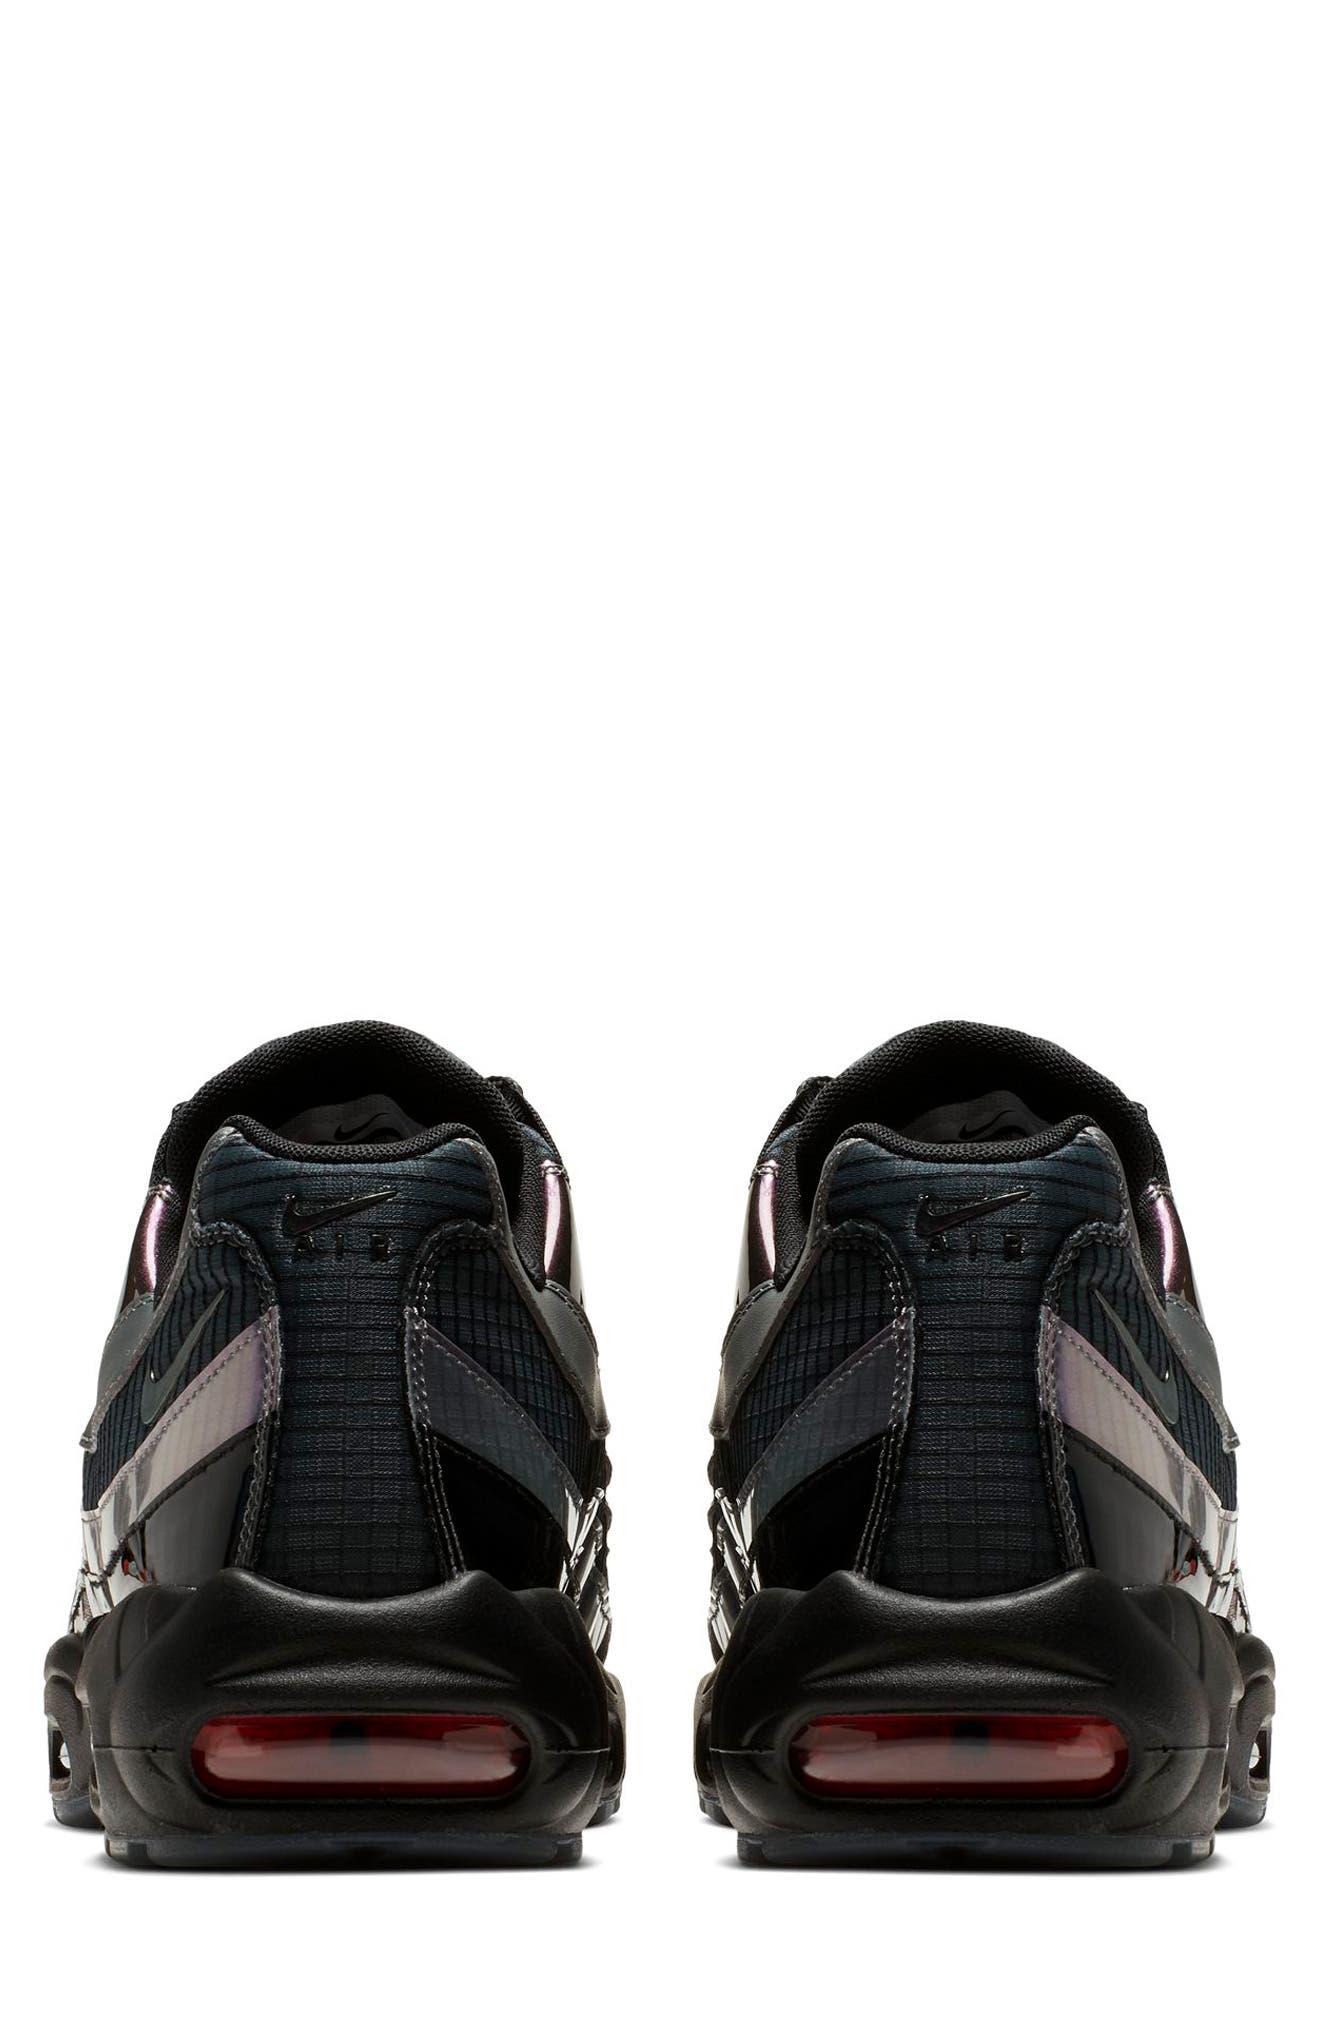 Air Max 95 LV8 Sneaker,                             Alternate thumbnail 2, color,                             001